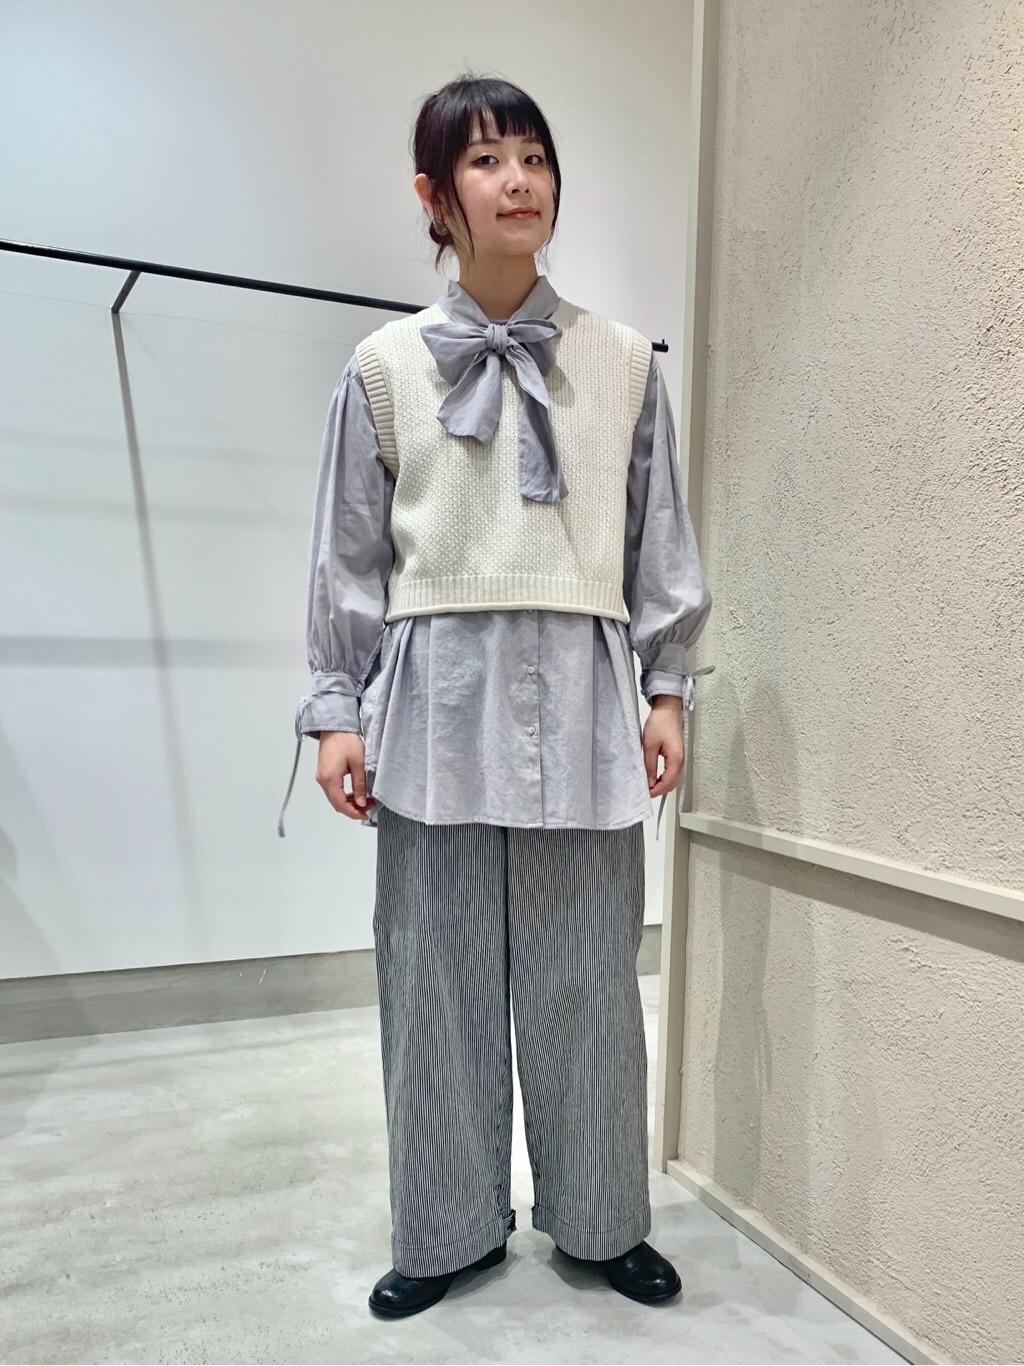 chambre de charme 横浜ジョイナス 身長:162cm 2021.02.08